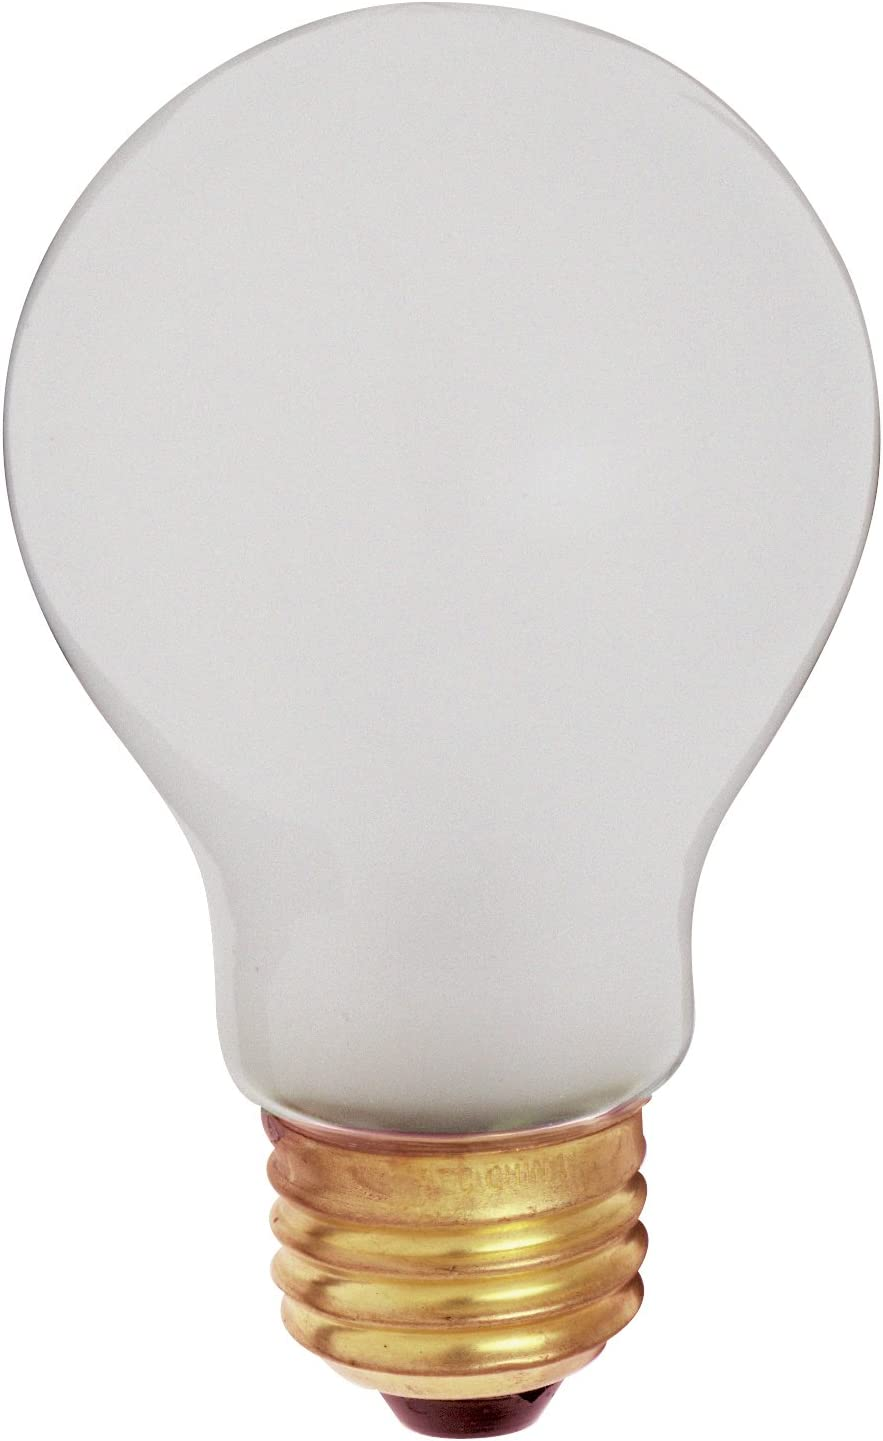 Satco S3929 100 Watt 960 Lumens A19 Incandescent Rough Service Shatterproof Light Bulb, 2-Pack